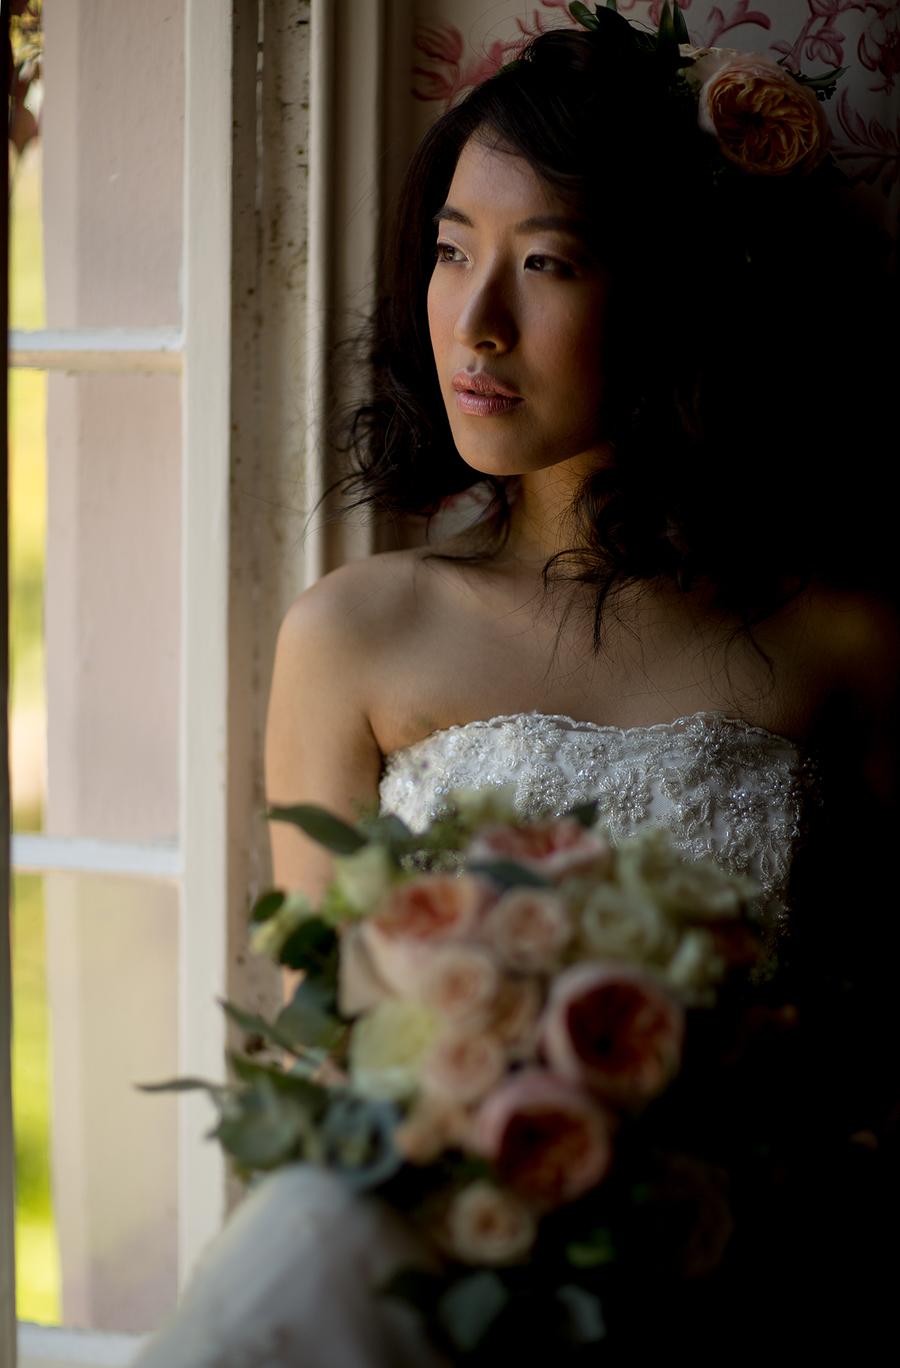 Jasmine at Woodlands Castle / Photography by jakabi, Model Jasmine Lam / Uploaded 6th September 2015 @ 09:10 PM